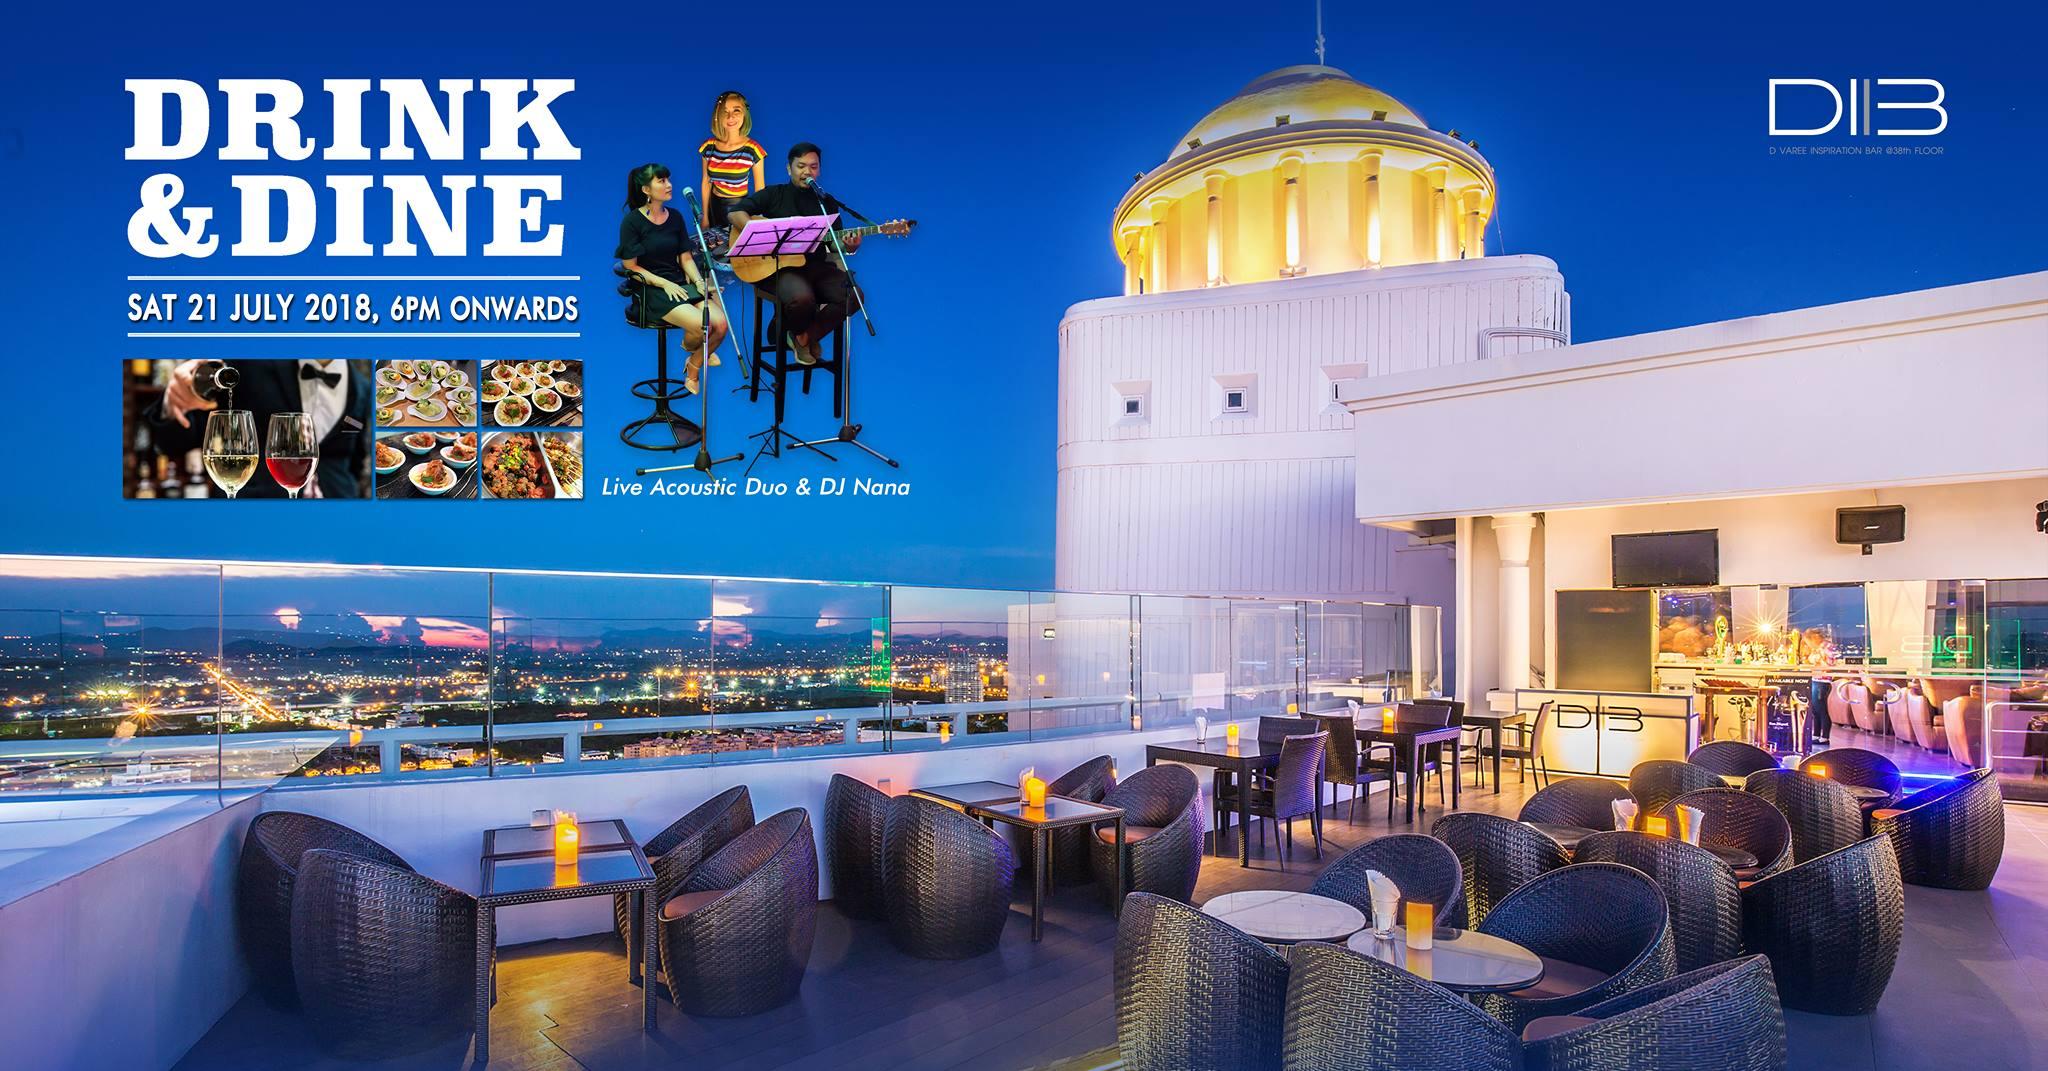 Drink n Dine at D.I.B Sky Bar, Pattaya 13 -